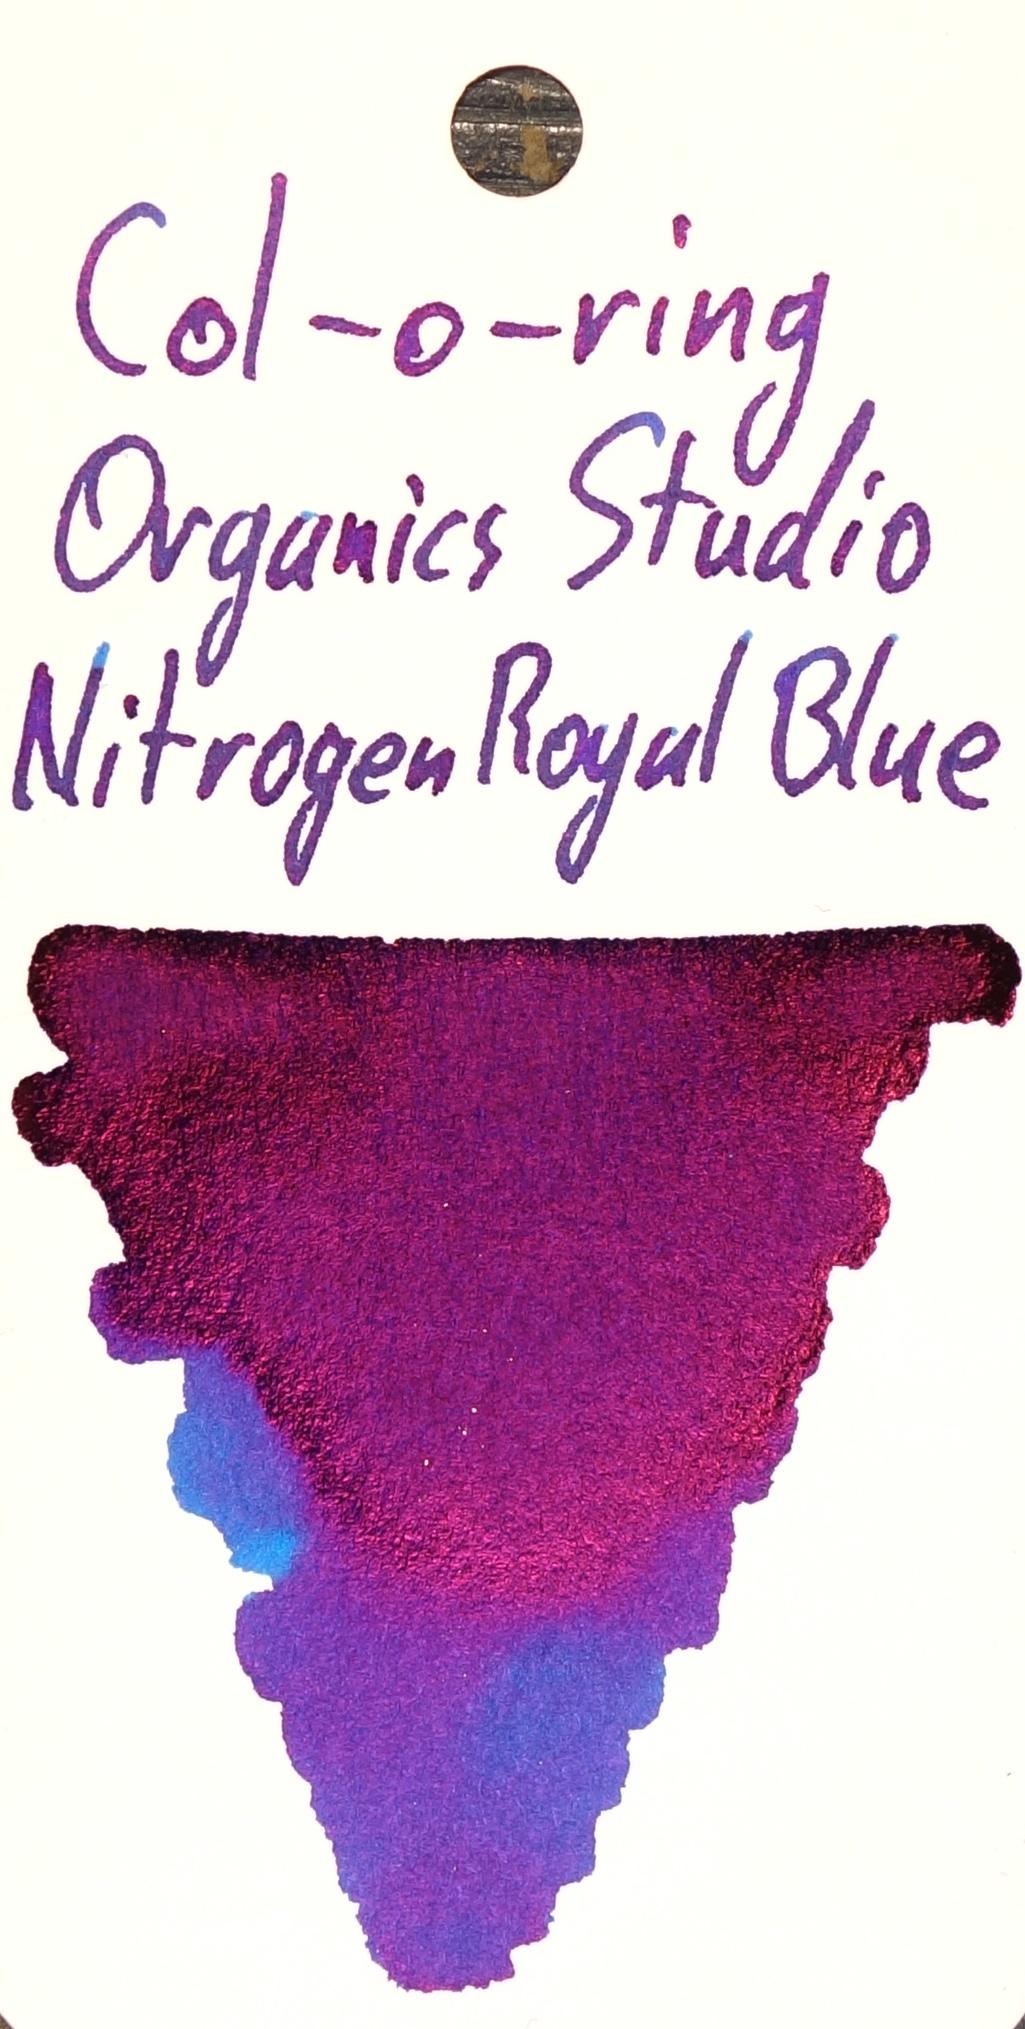 Organics Studio Nitrogen Royal Blue Col-o-ring.JPG